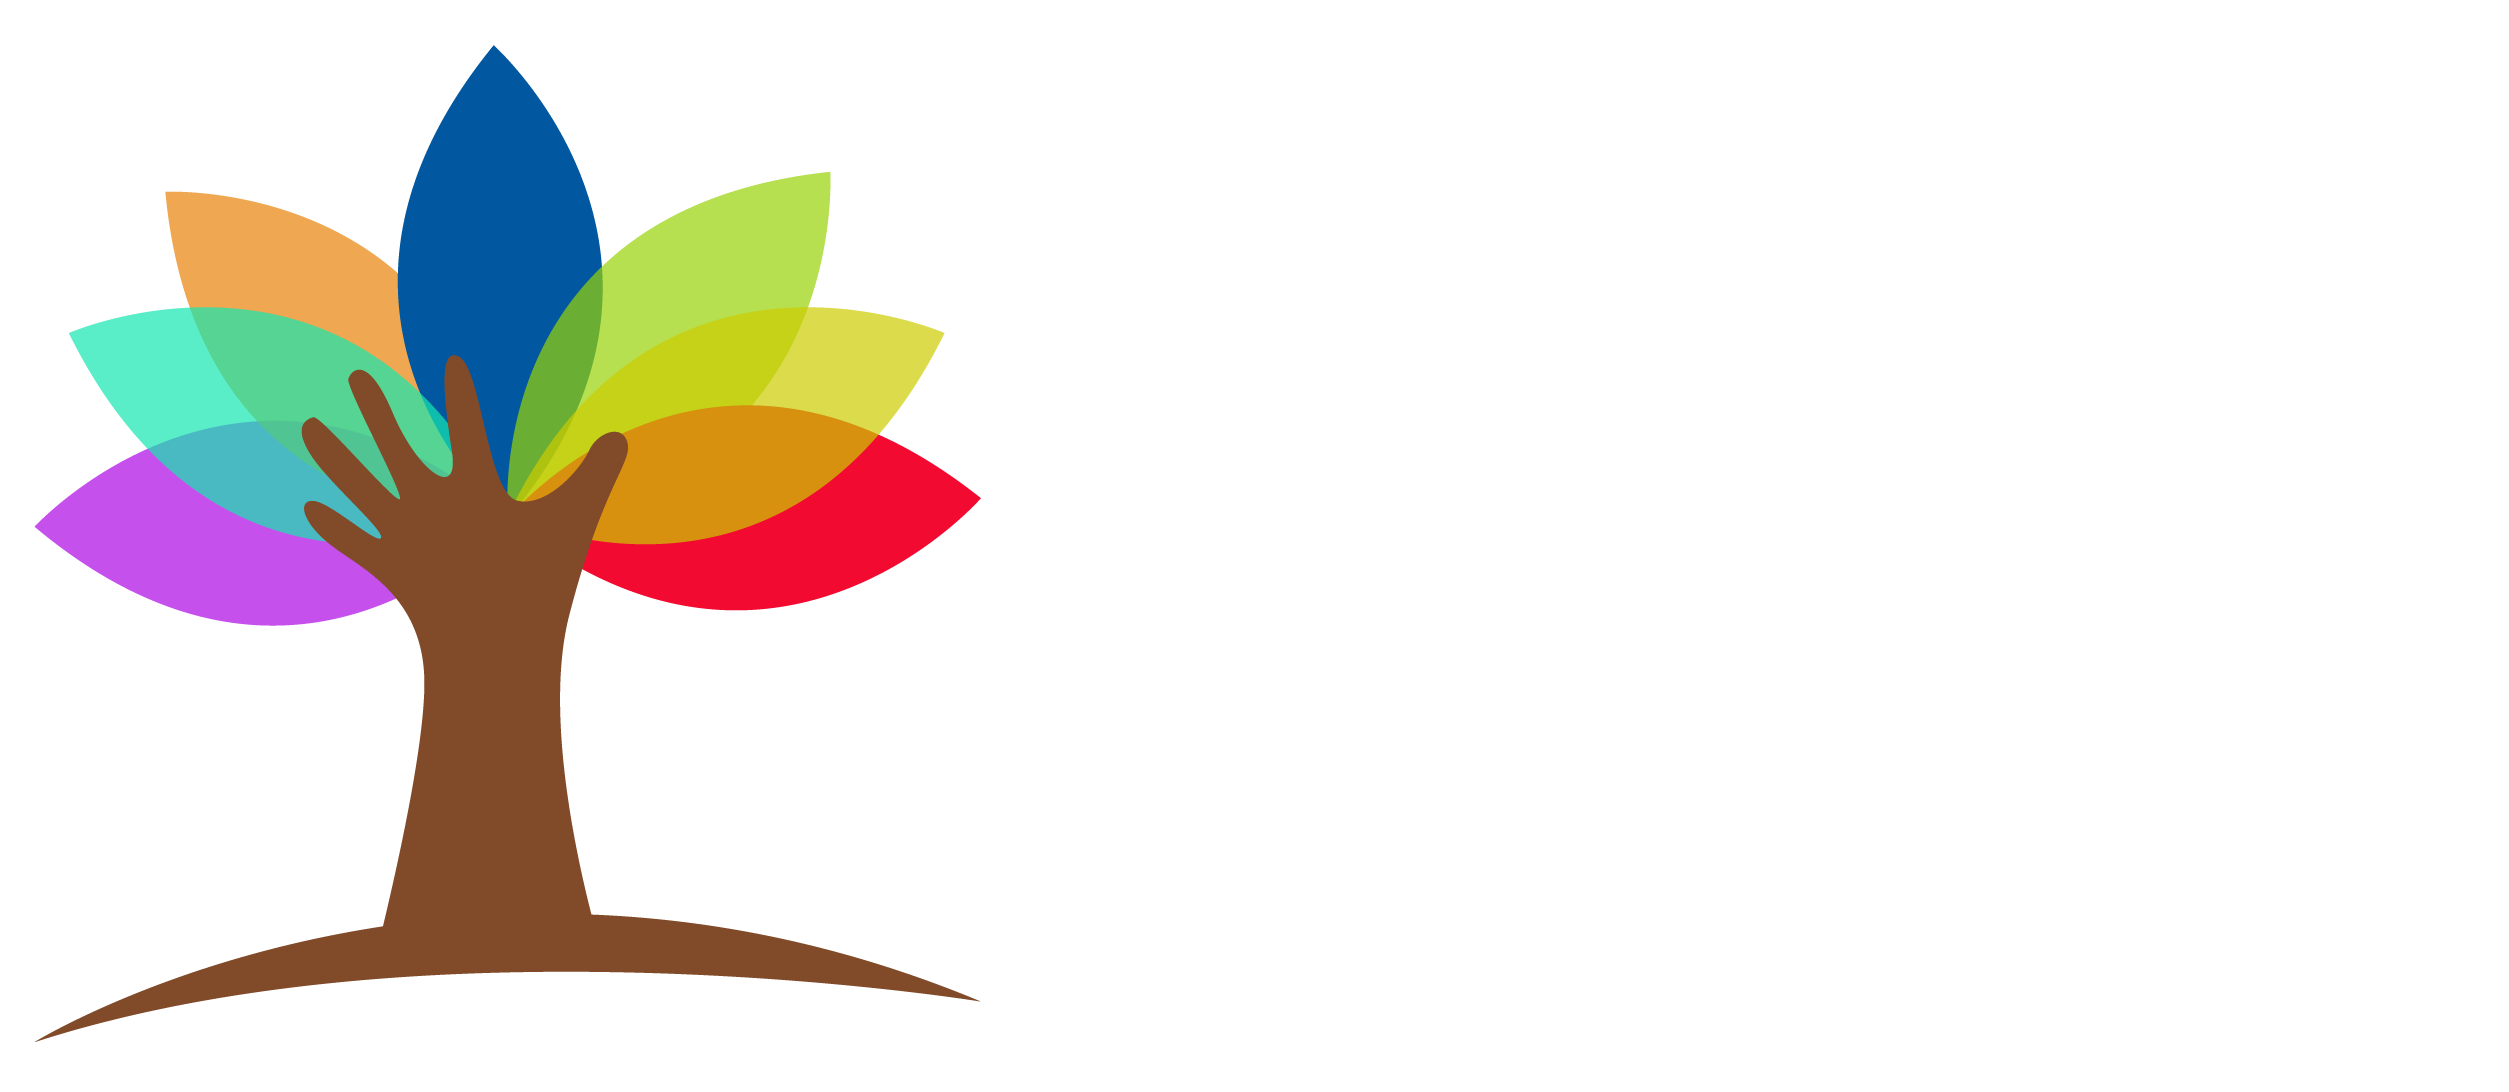 ¡ Todos Juntos Por Aysén !